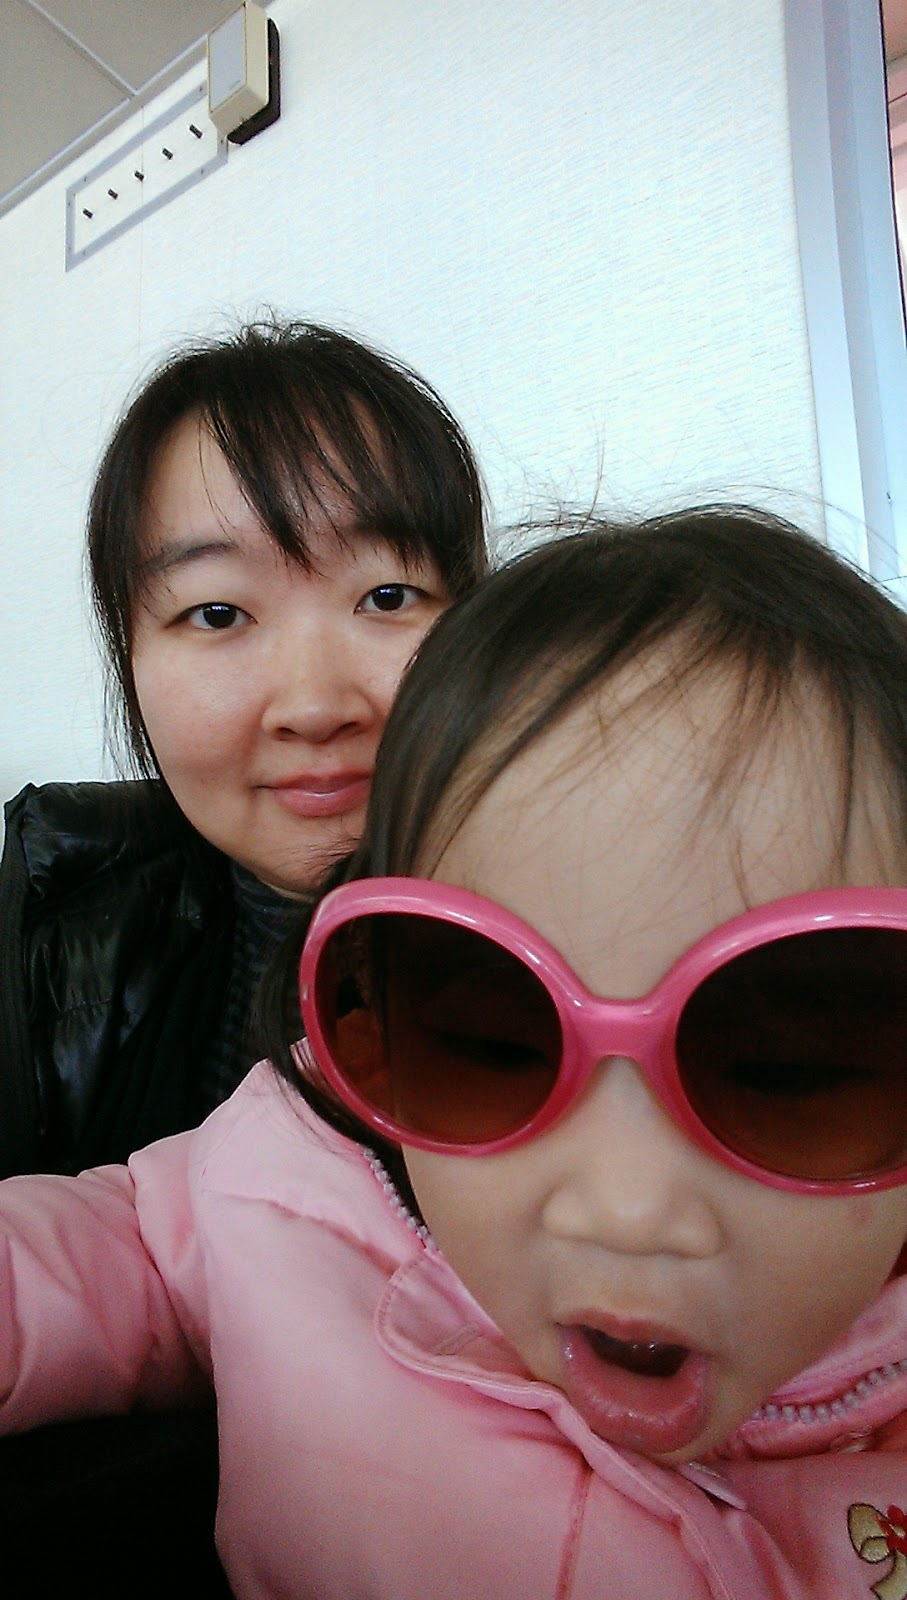 Sandy的澳客生活: Sandy@Tokyo-2014春遊東京(2014/03/14-19)Day3-6